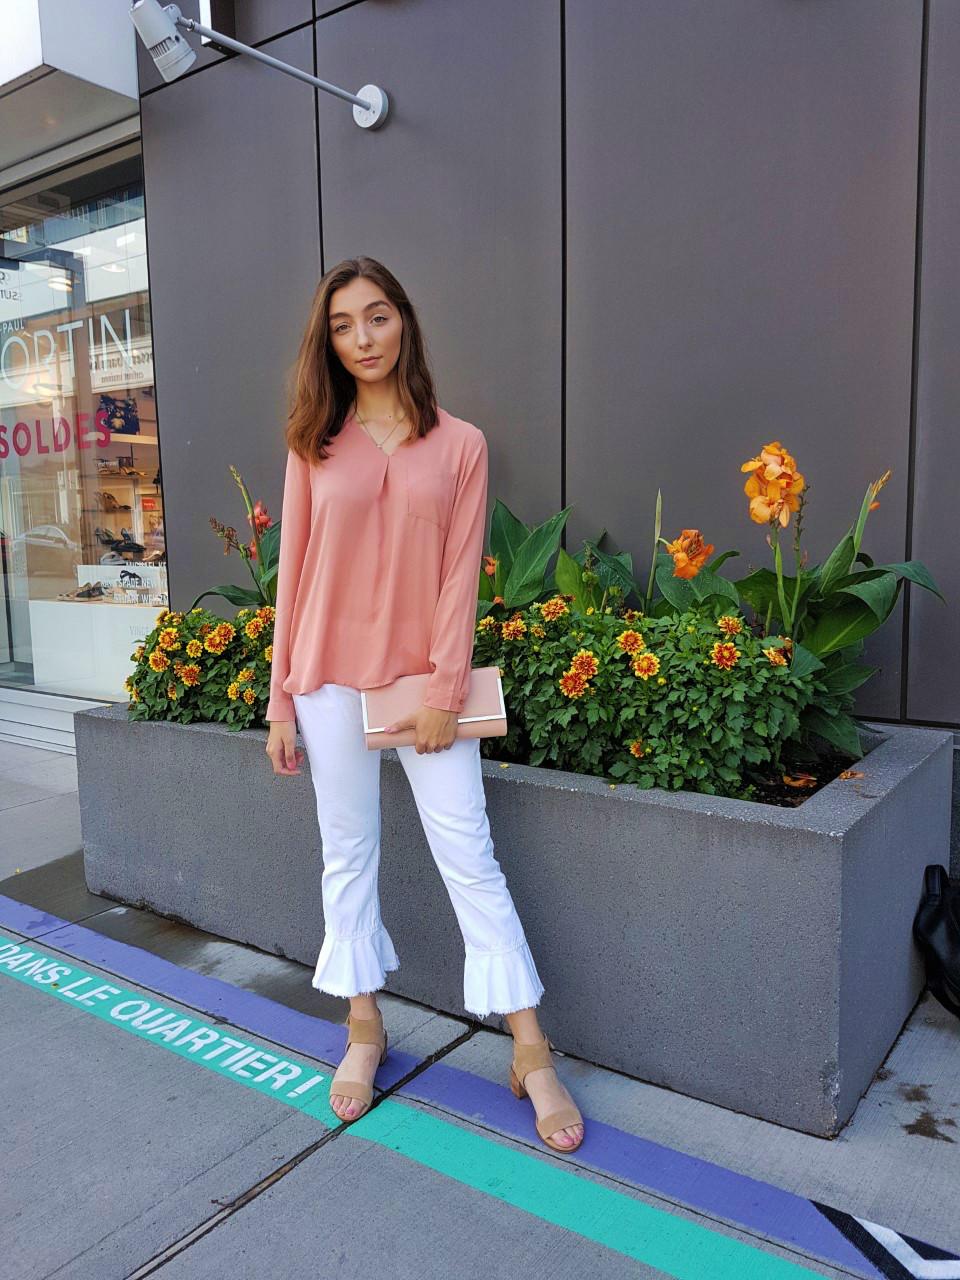 vero moda, zara, Aldo, fashion, trends, white denim, ruffles, summer, style, street style, Montreal, Canada, blogger